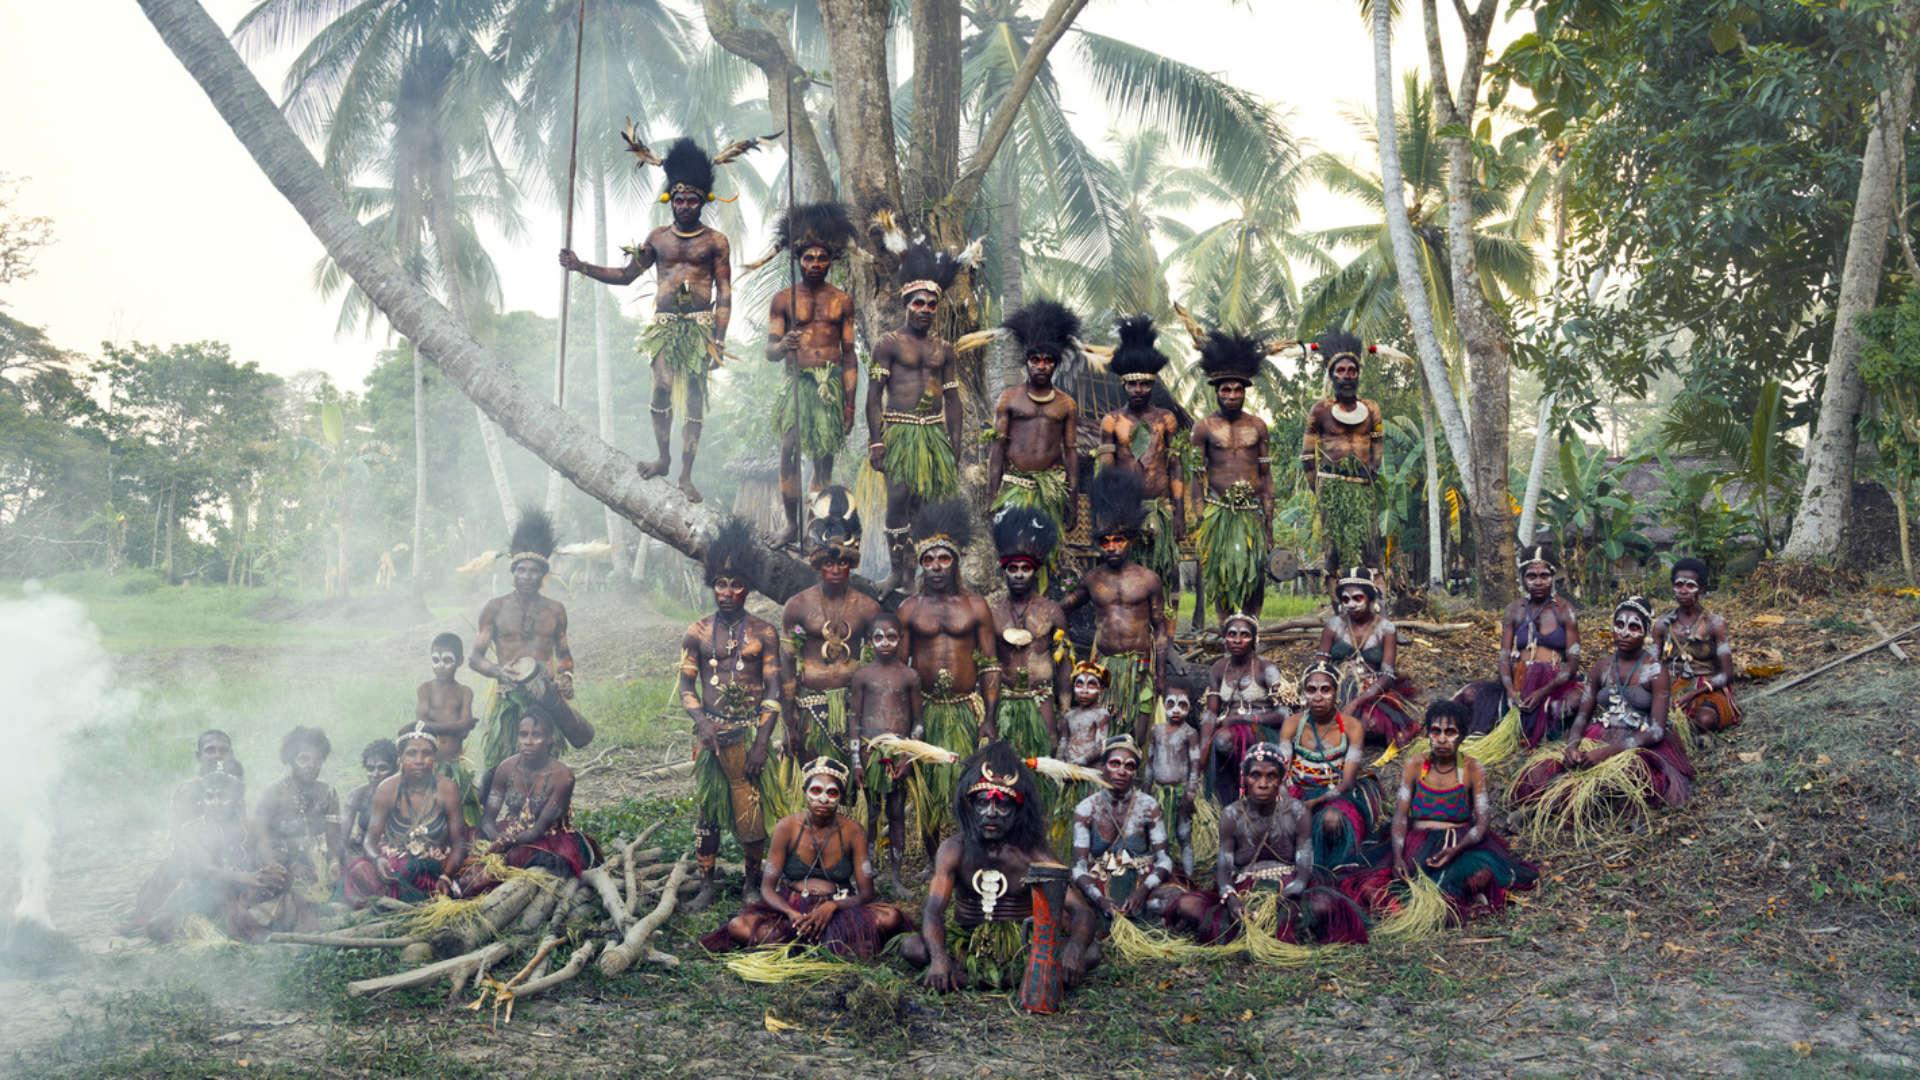 Iatmul stam, Palimbei, Papoea-Nieuw-Guinea